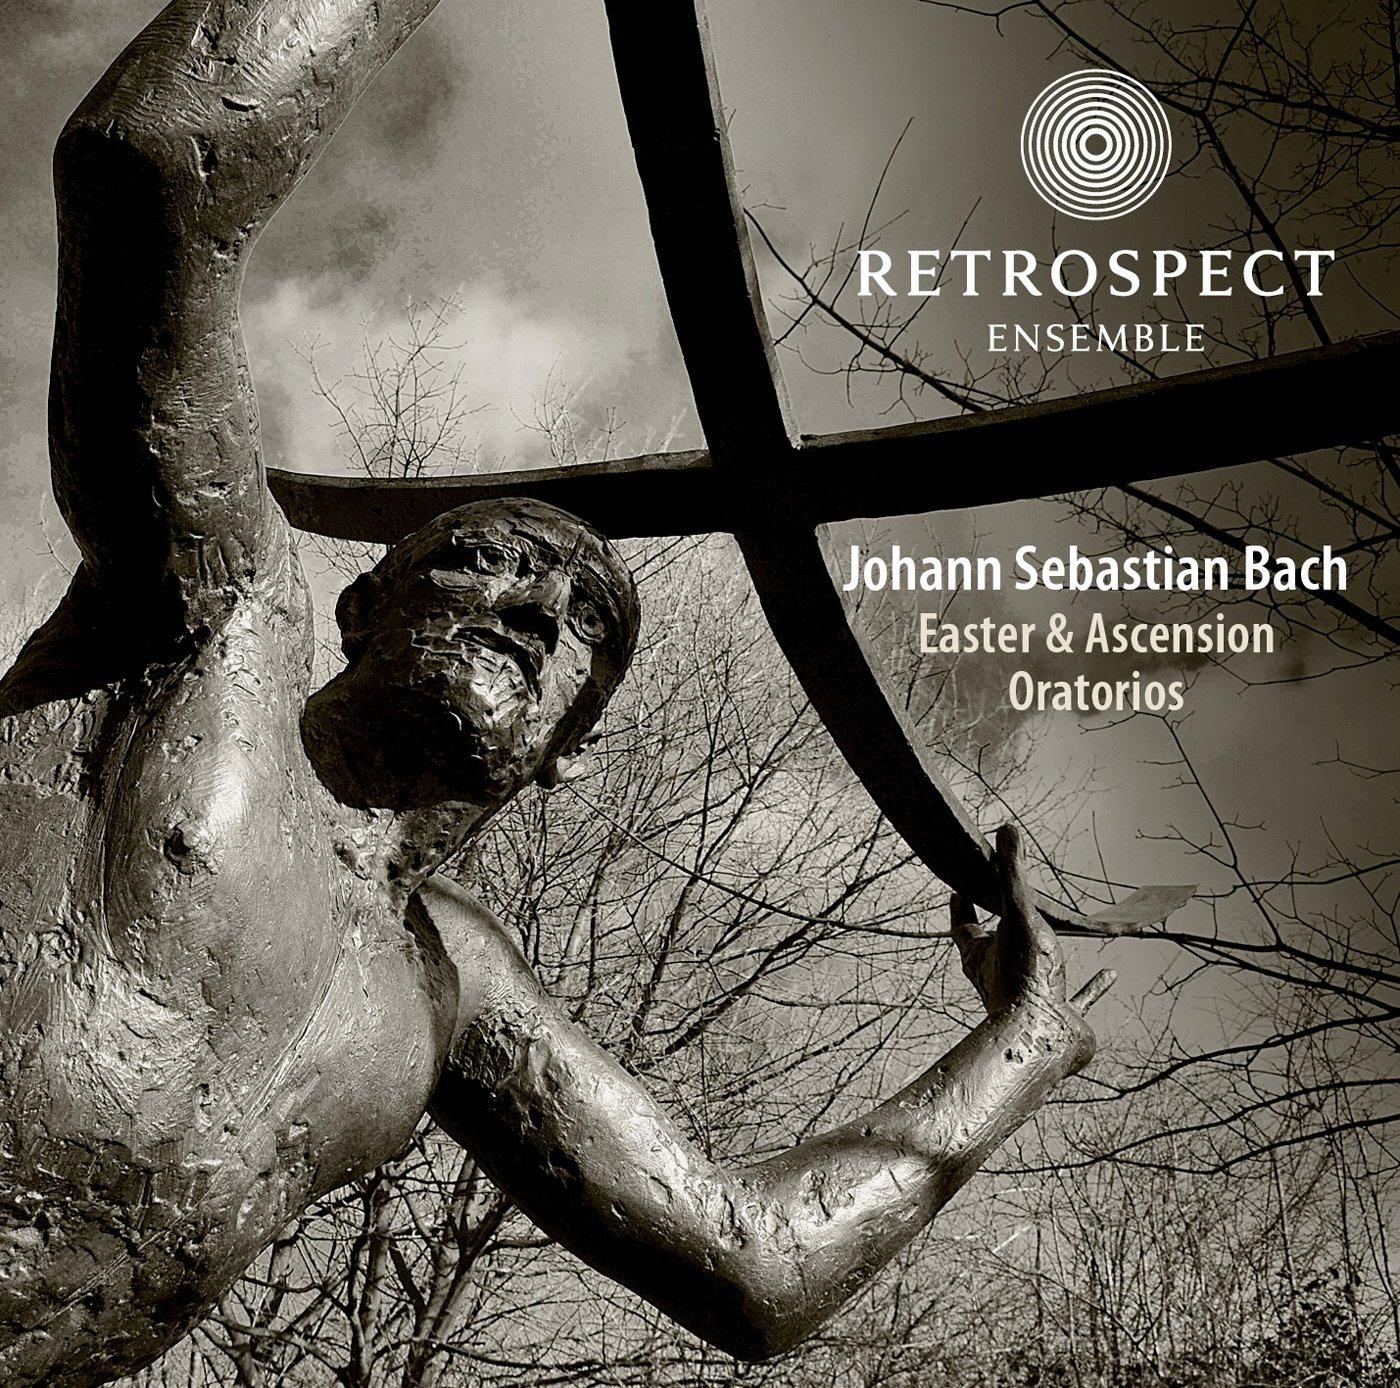 Bach Easter & Ascension Oratorios